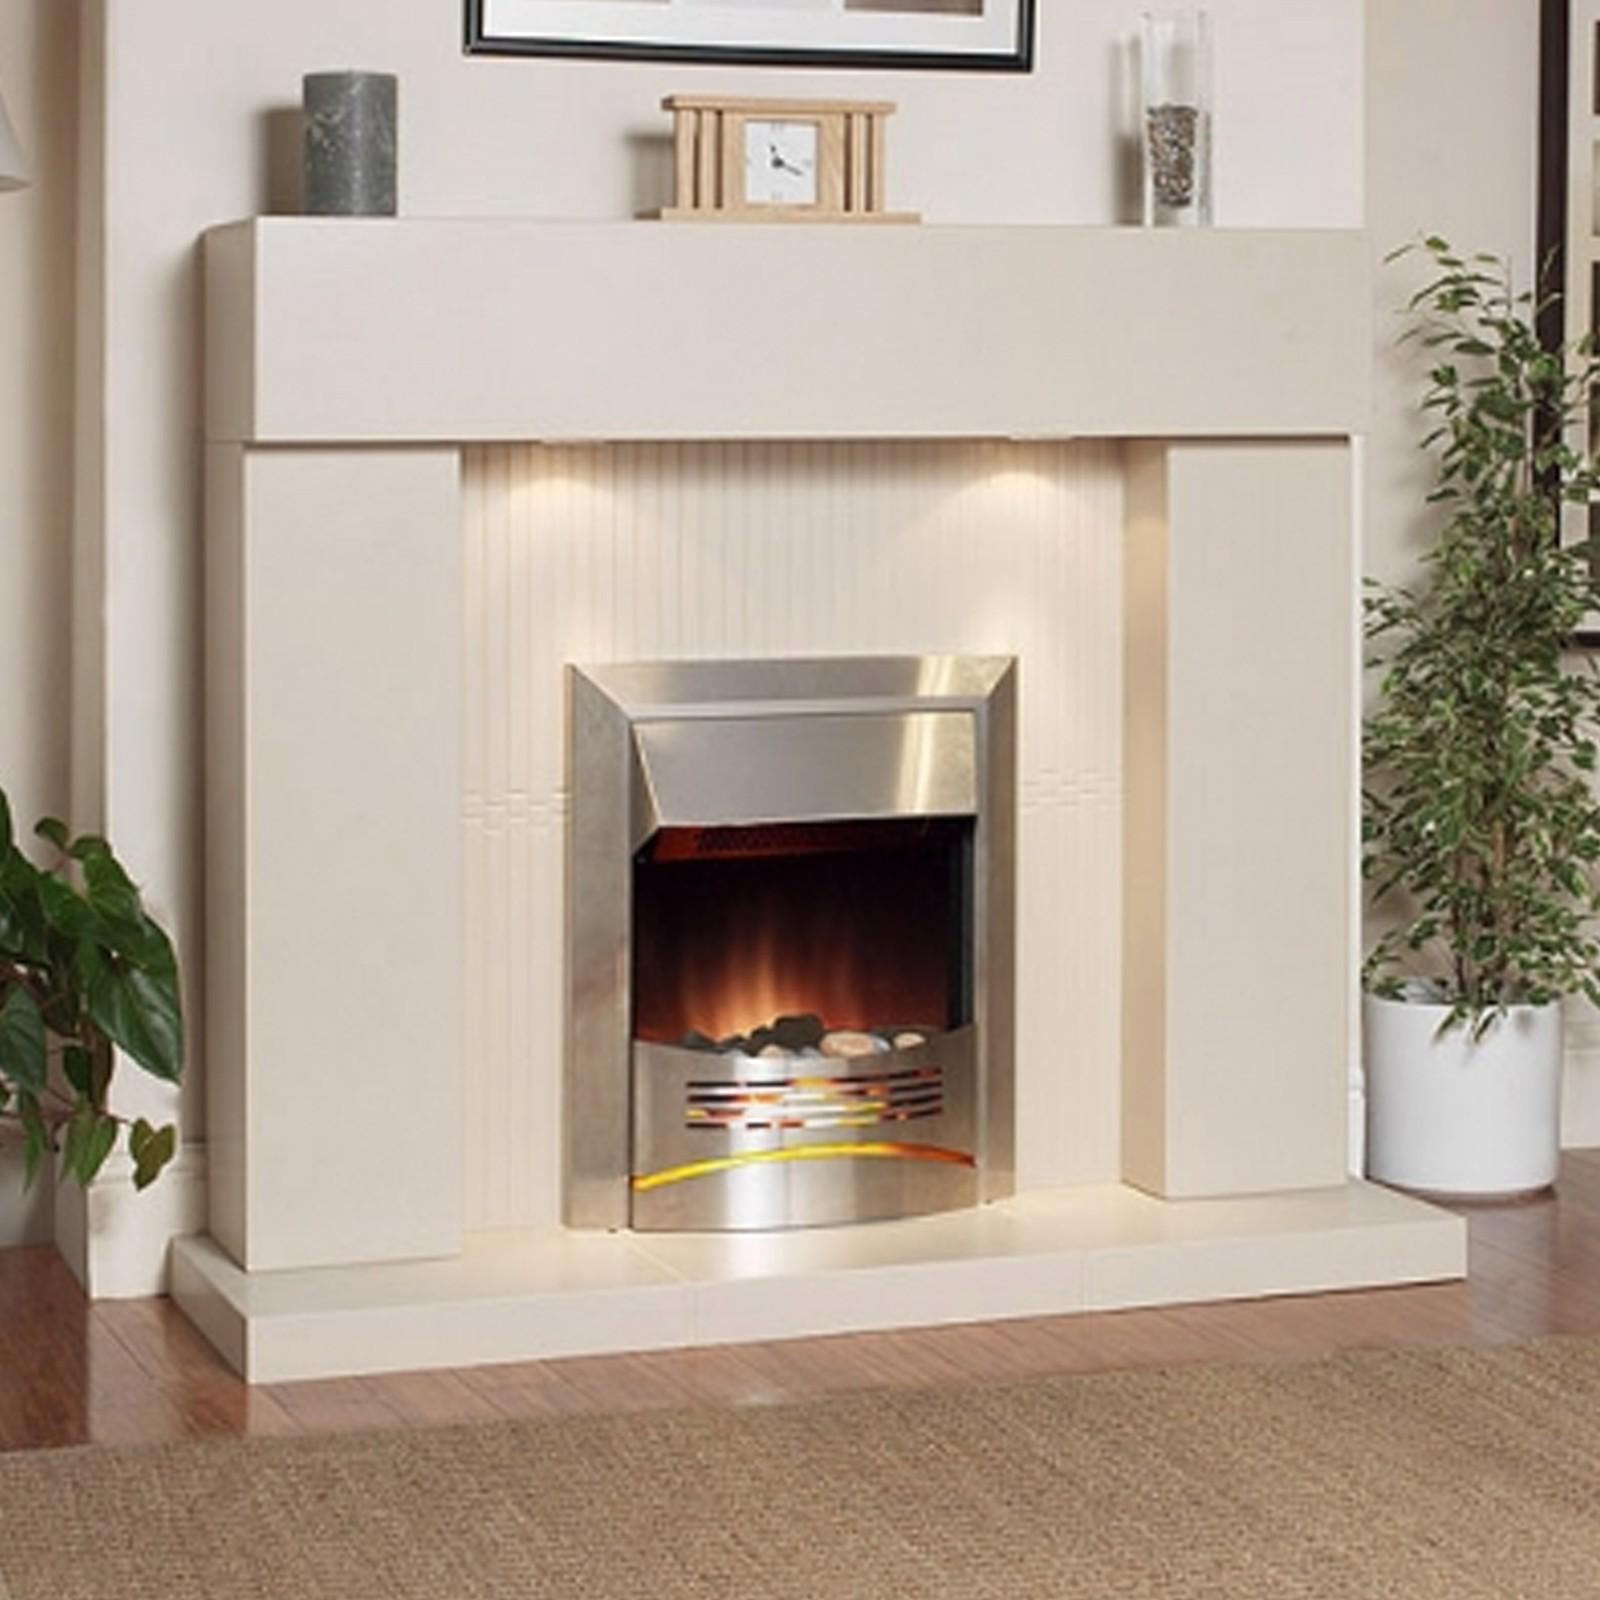 stone suite katell durban electric fireplace suite best deals